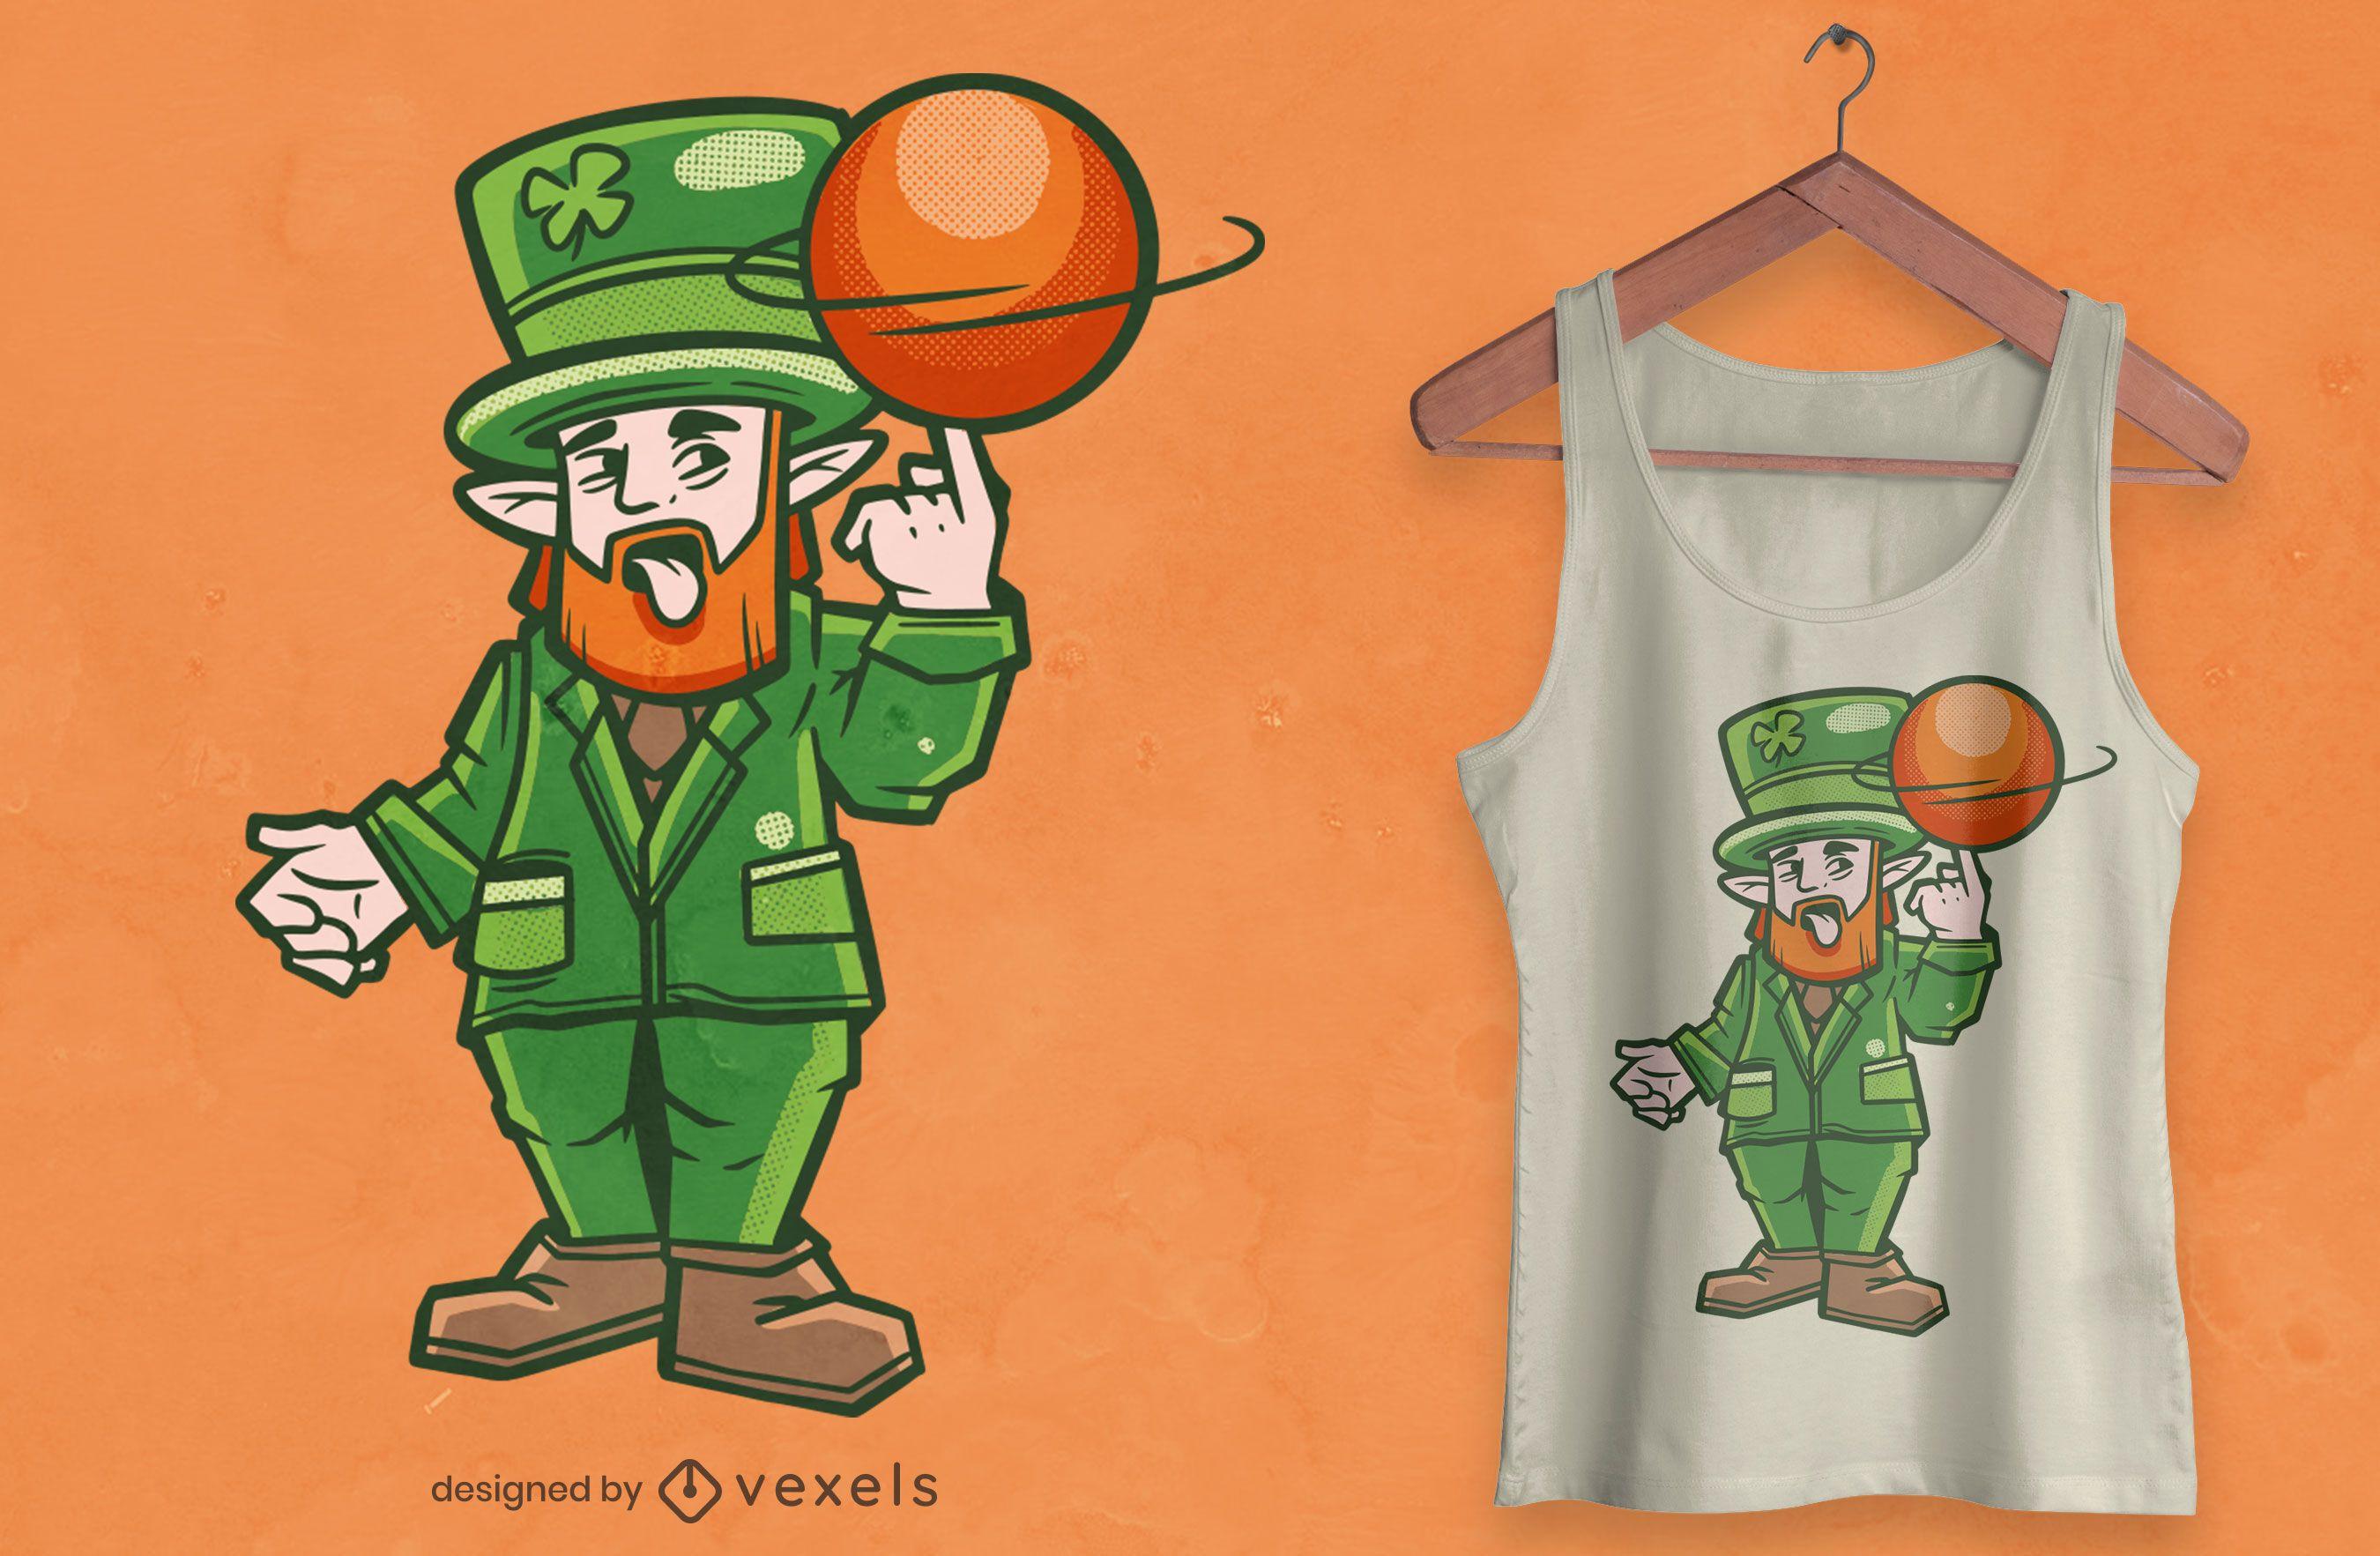 Diseño de camiseta de duende de baloncesto.